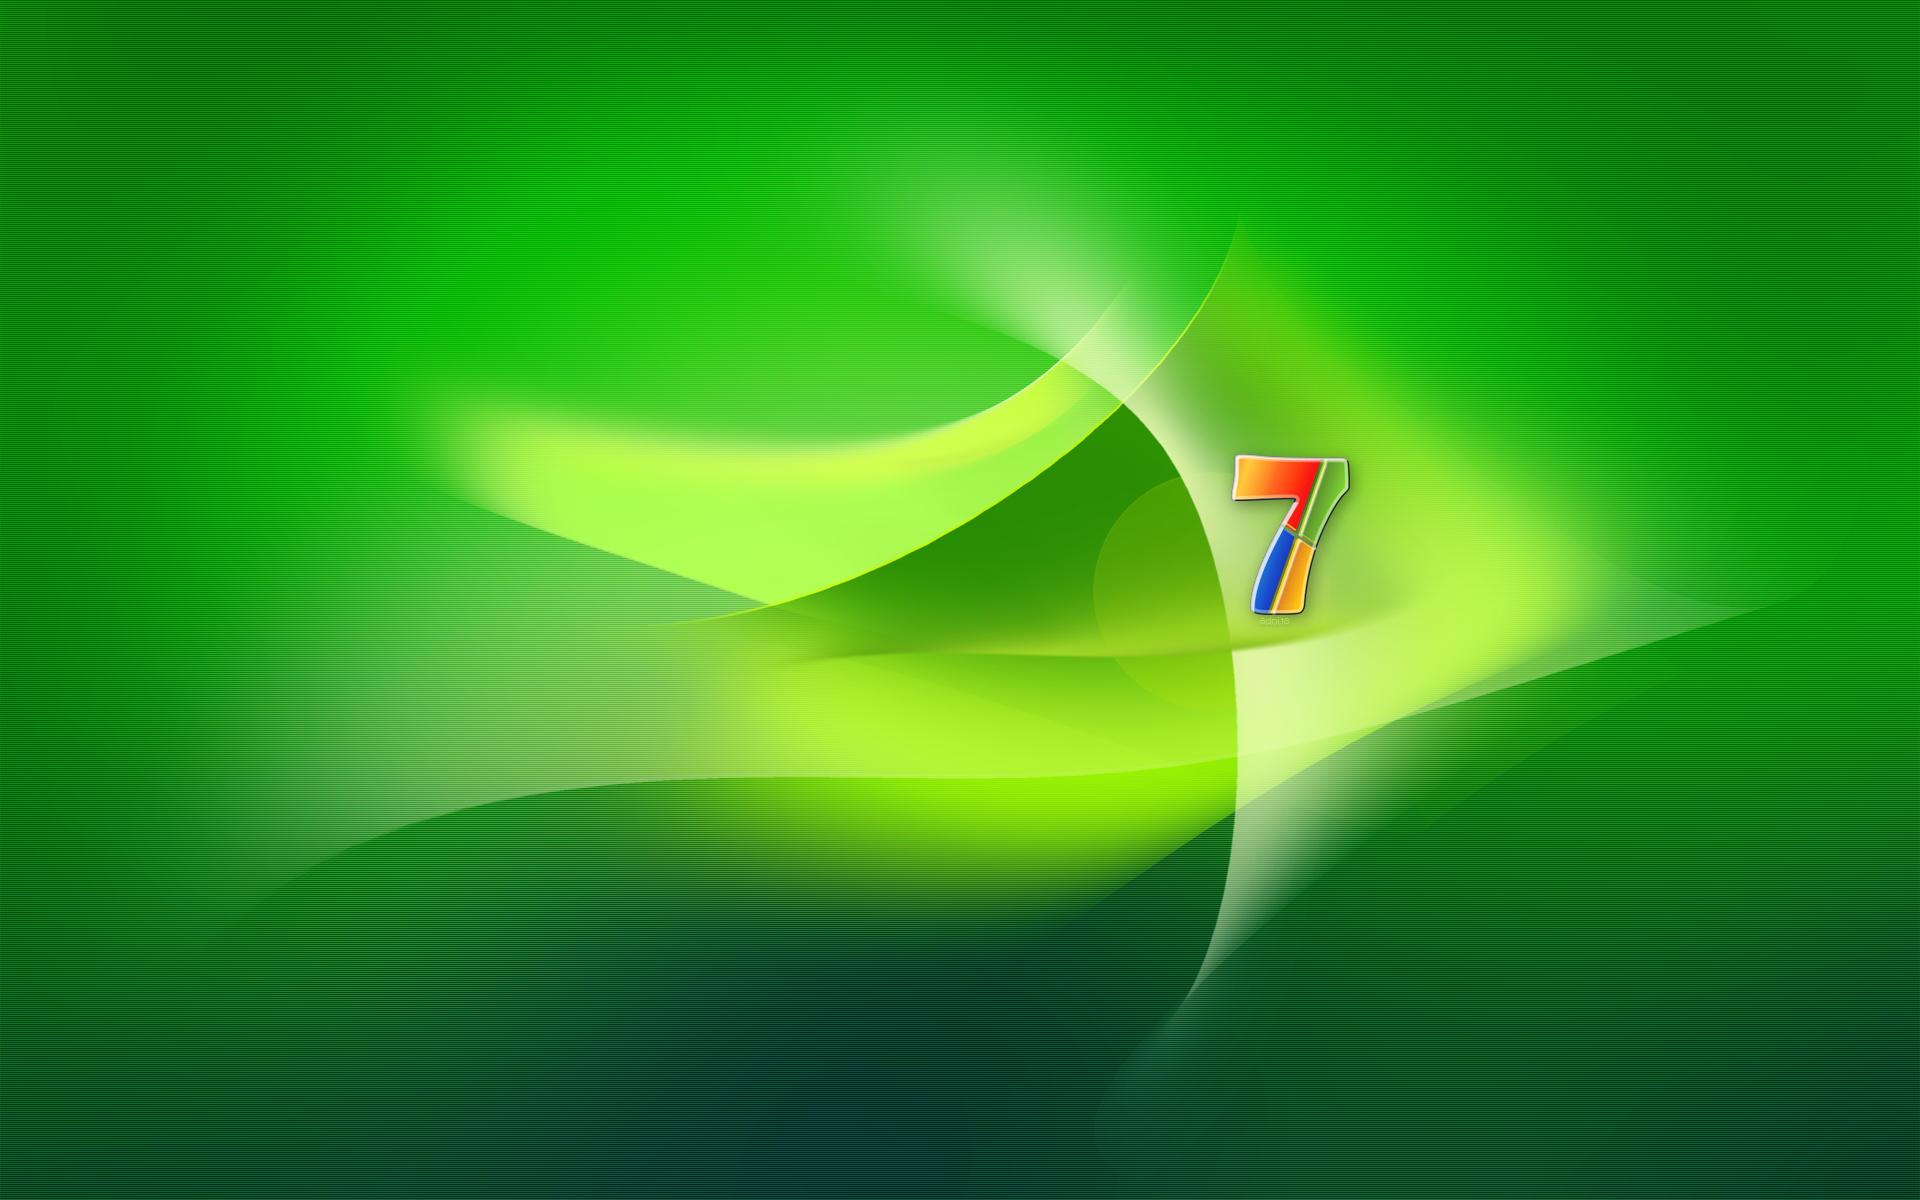 Windows 7 Seven Green by adni18